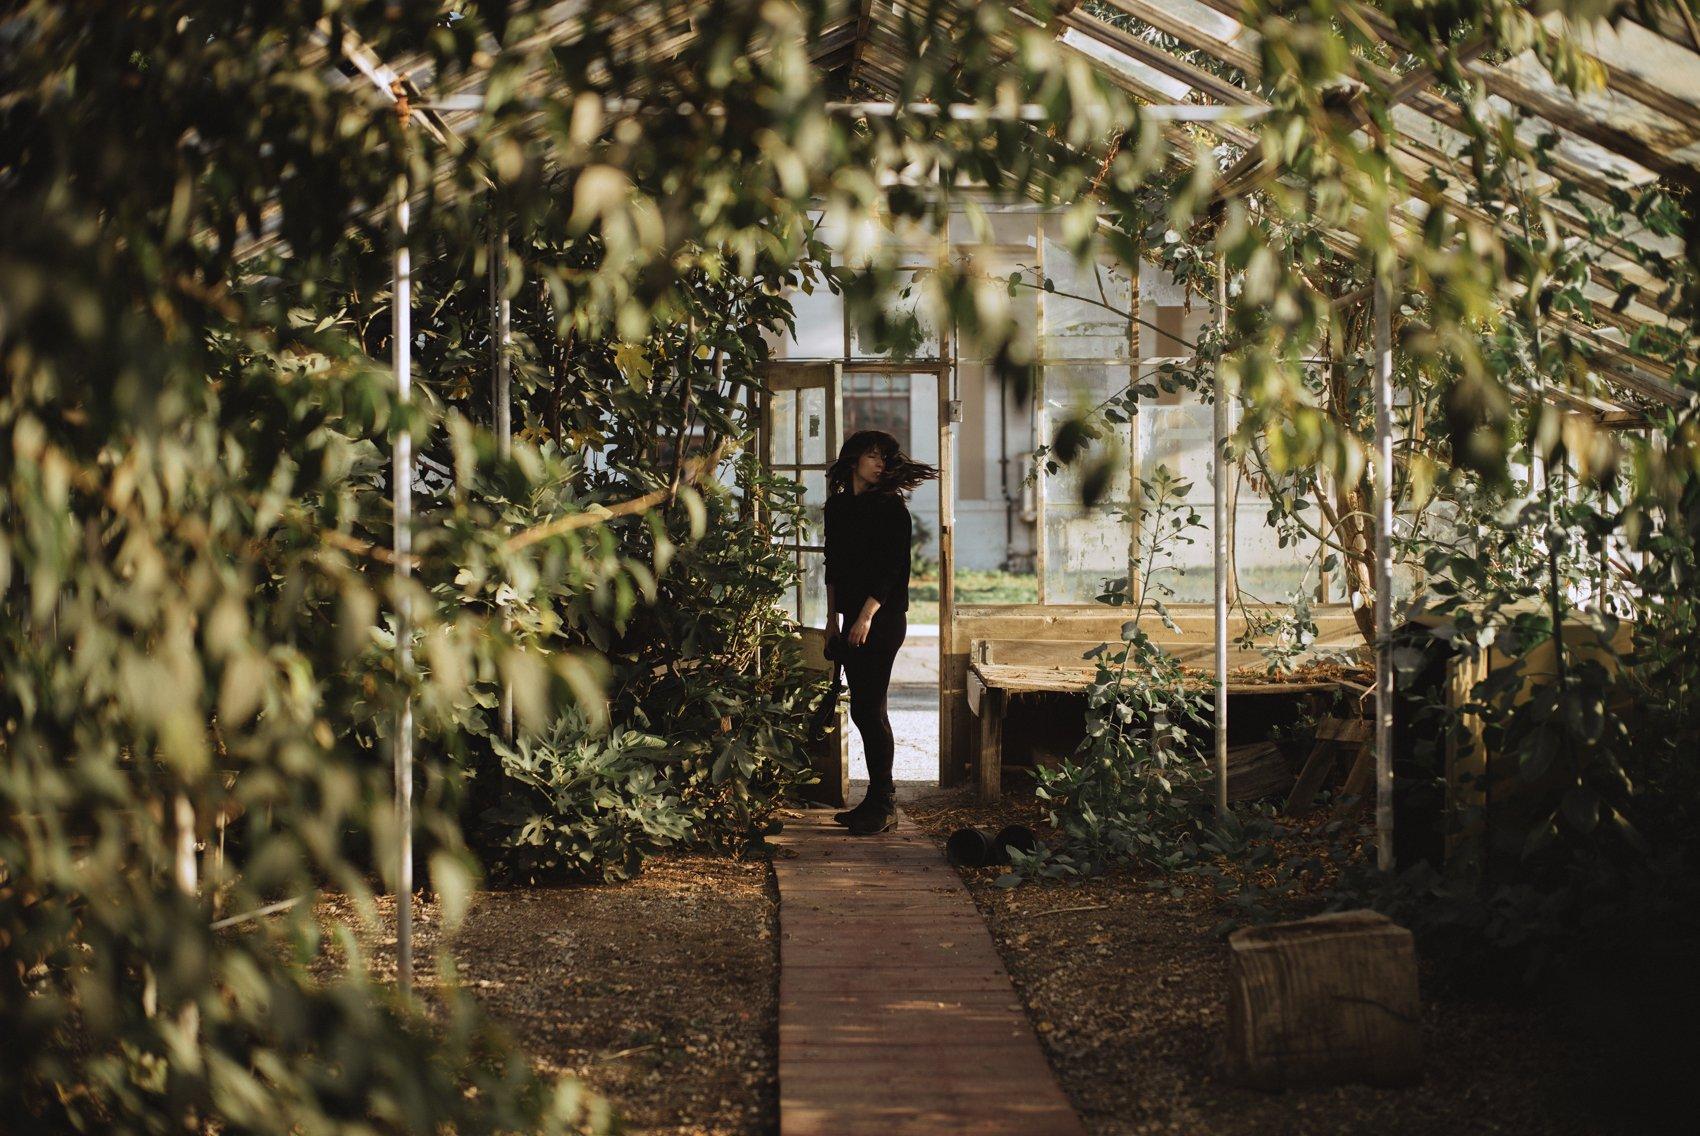 lanterman abandoned pomona greenhouse urban exploring california los angeles photography leica teri b